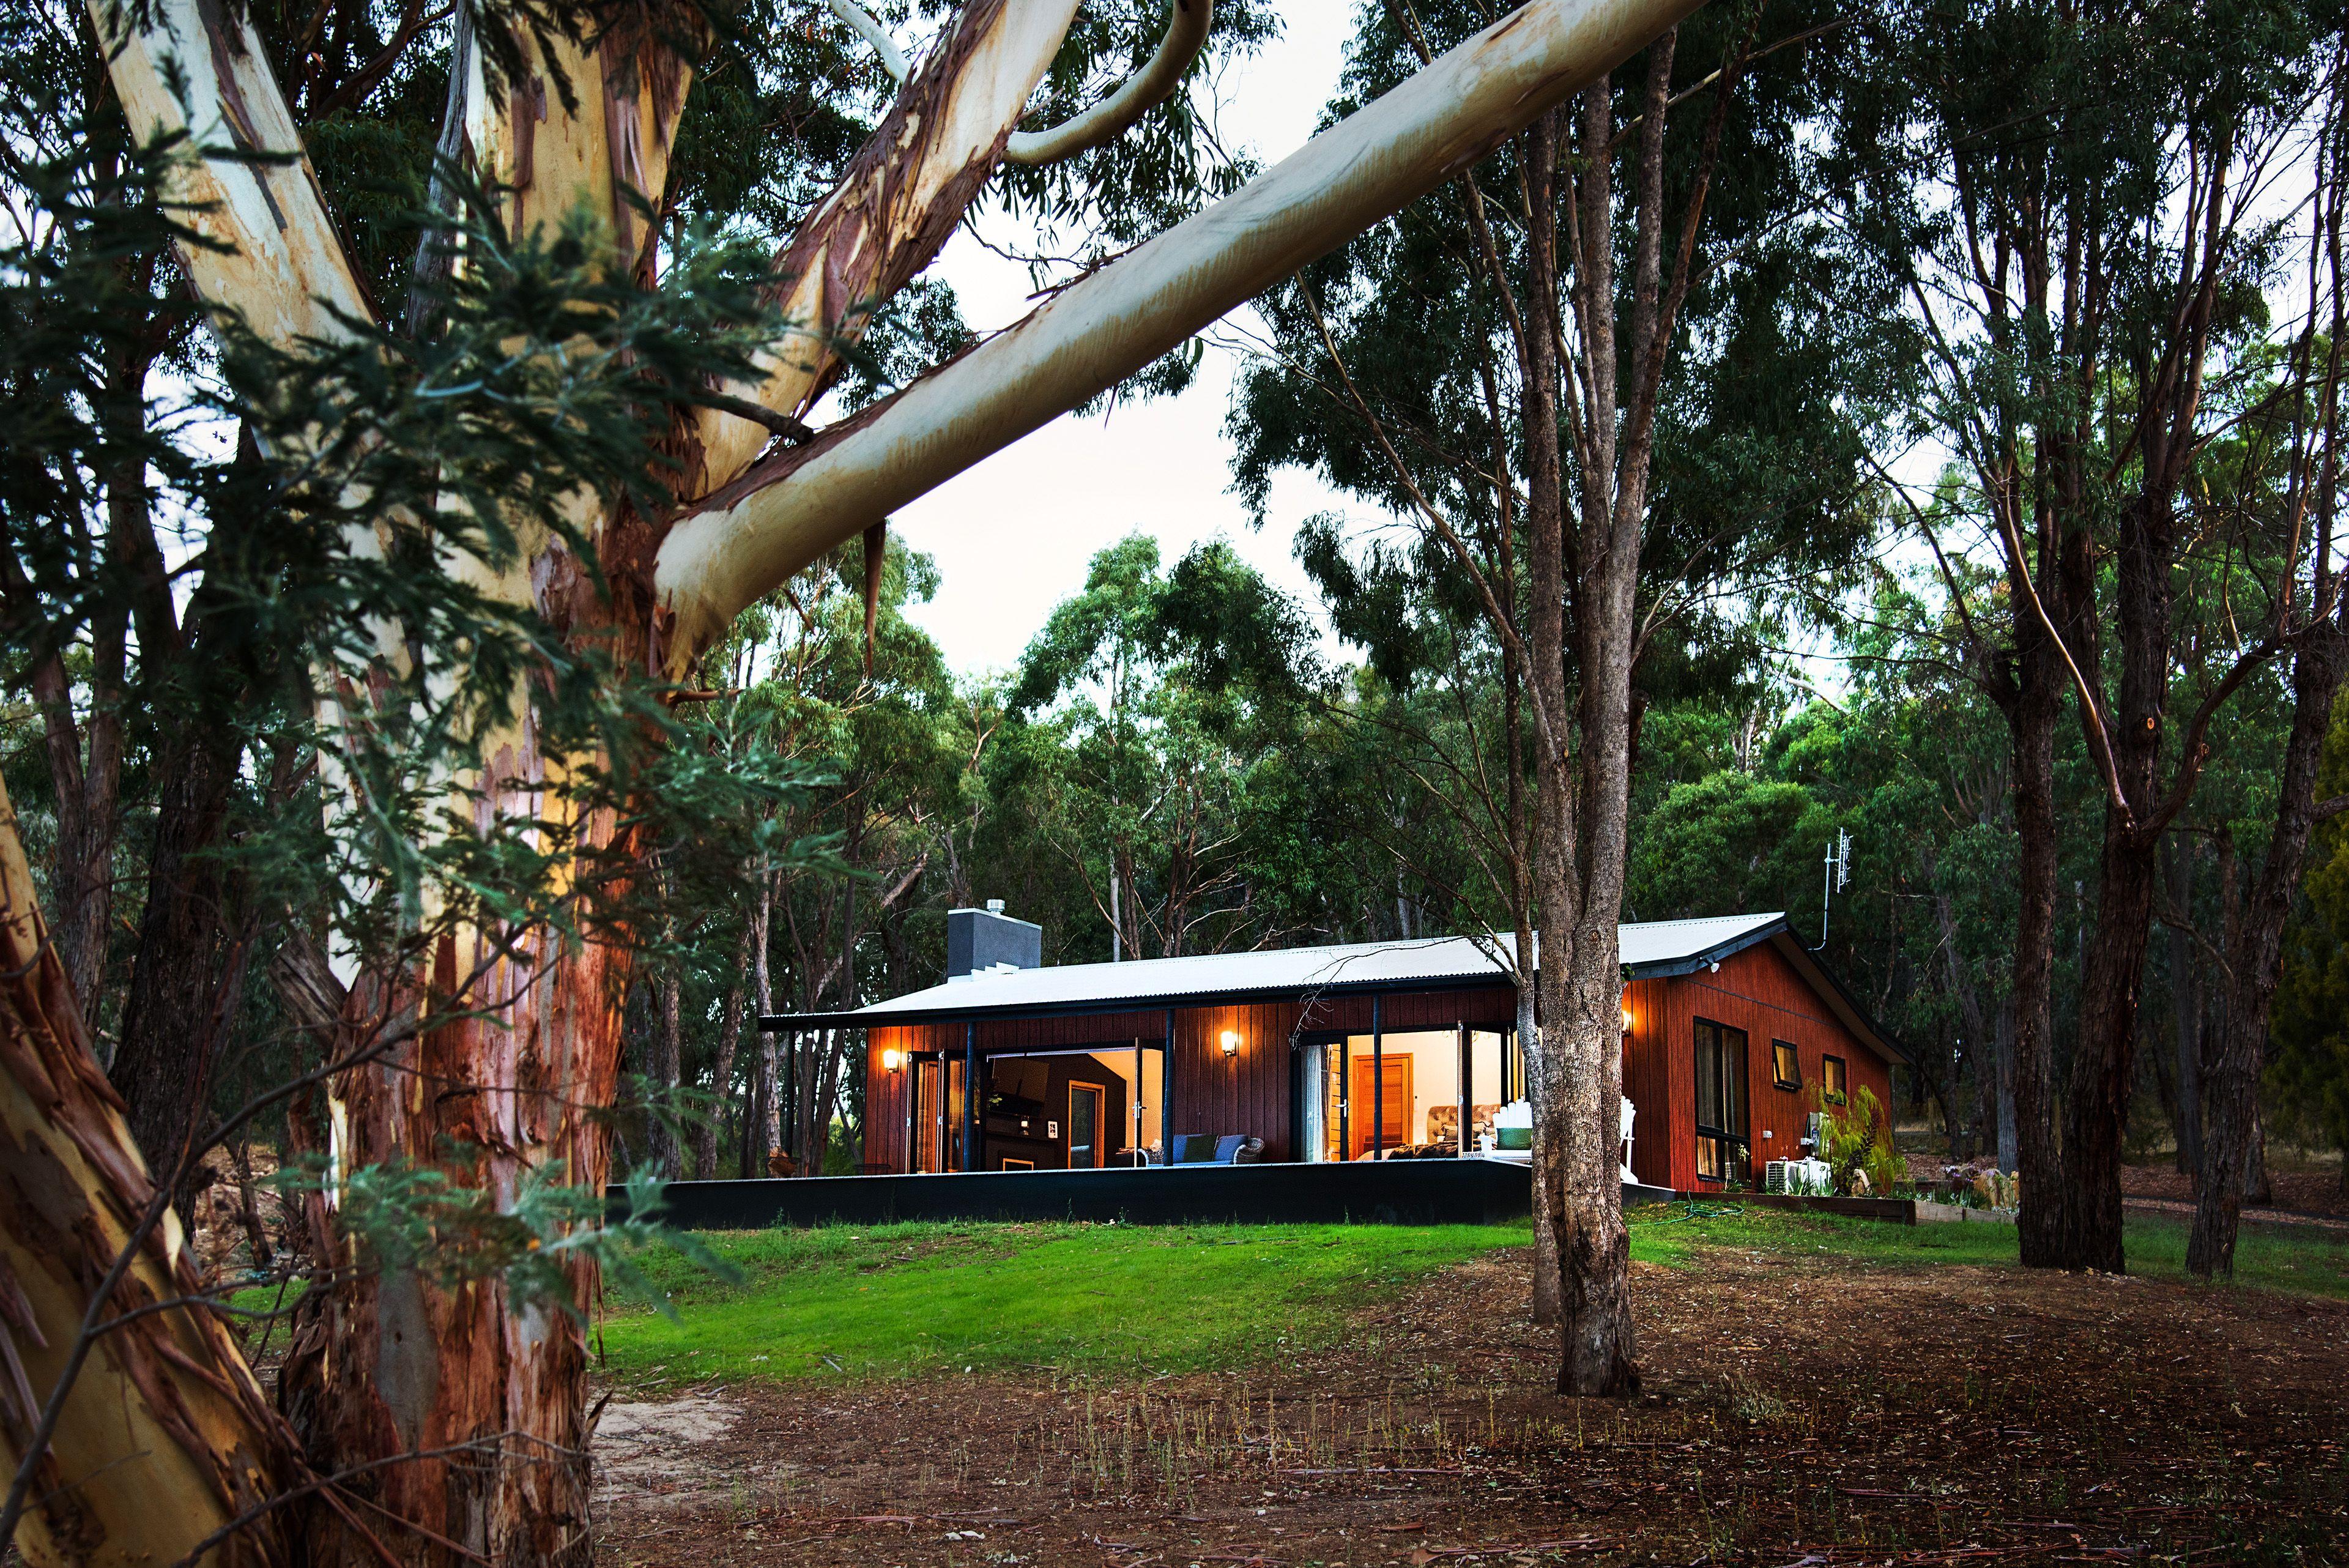 Daylesford & Hepburn Springs, Victoria, Australia Located